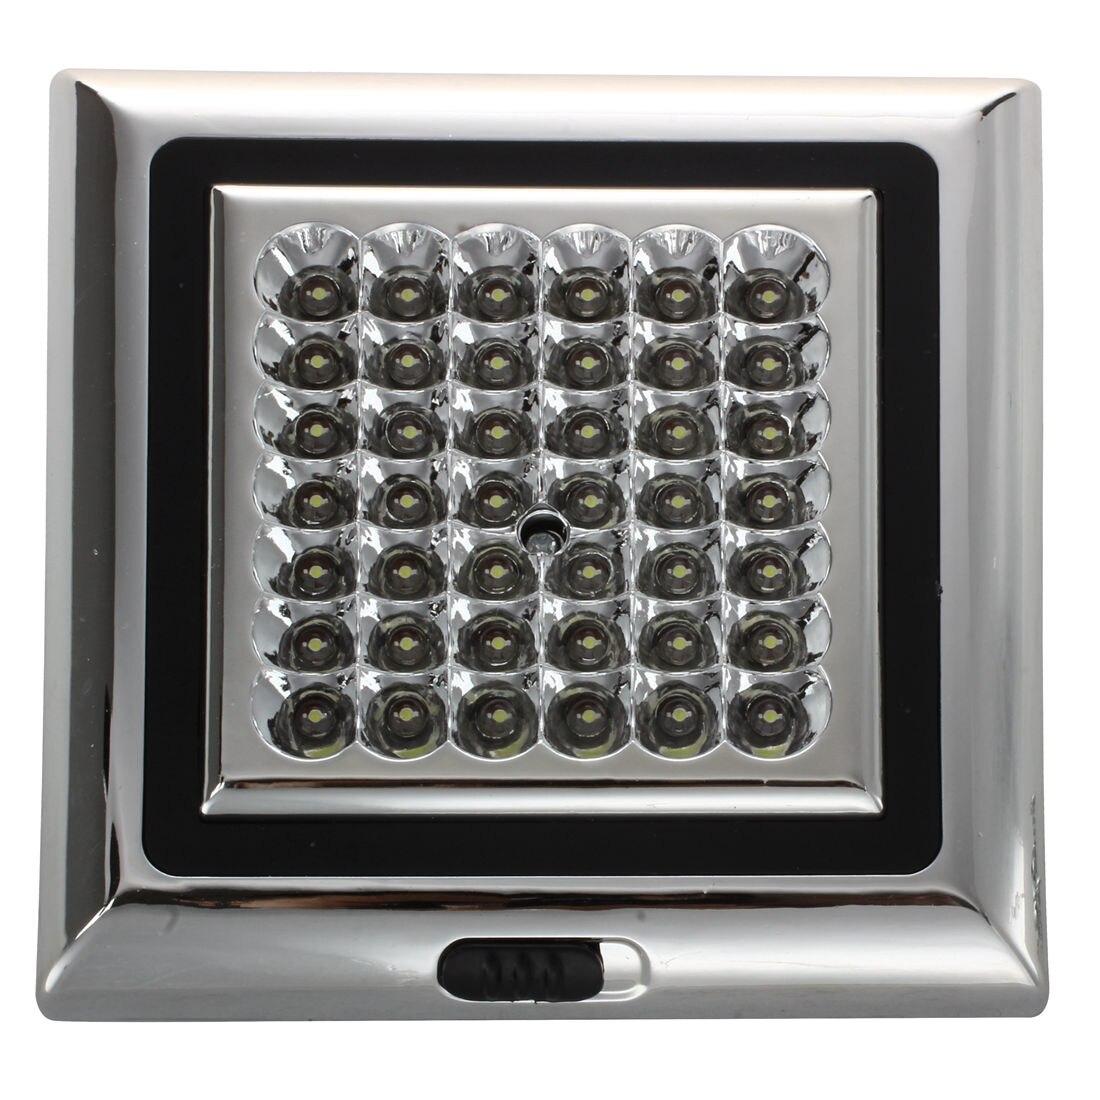 42-LED Brilliant White Car Auto Ceiling Dome Interior Light Lamp DC 12V 5W